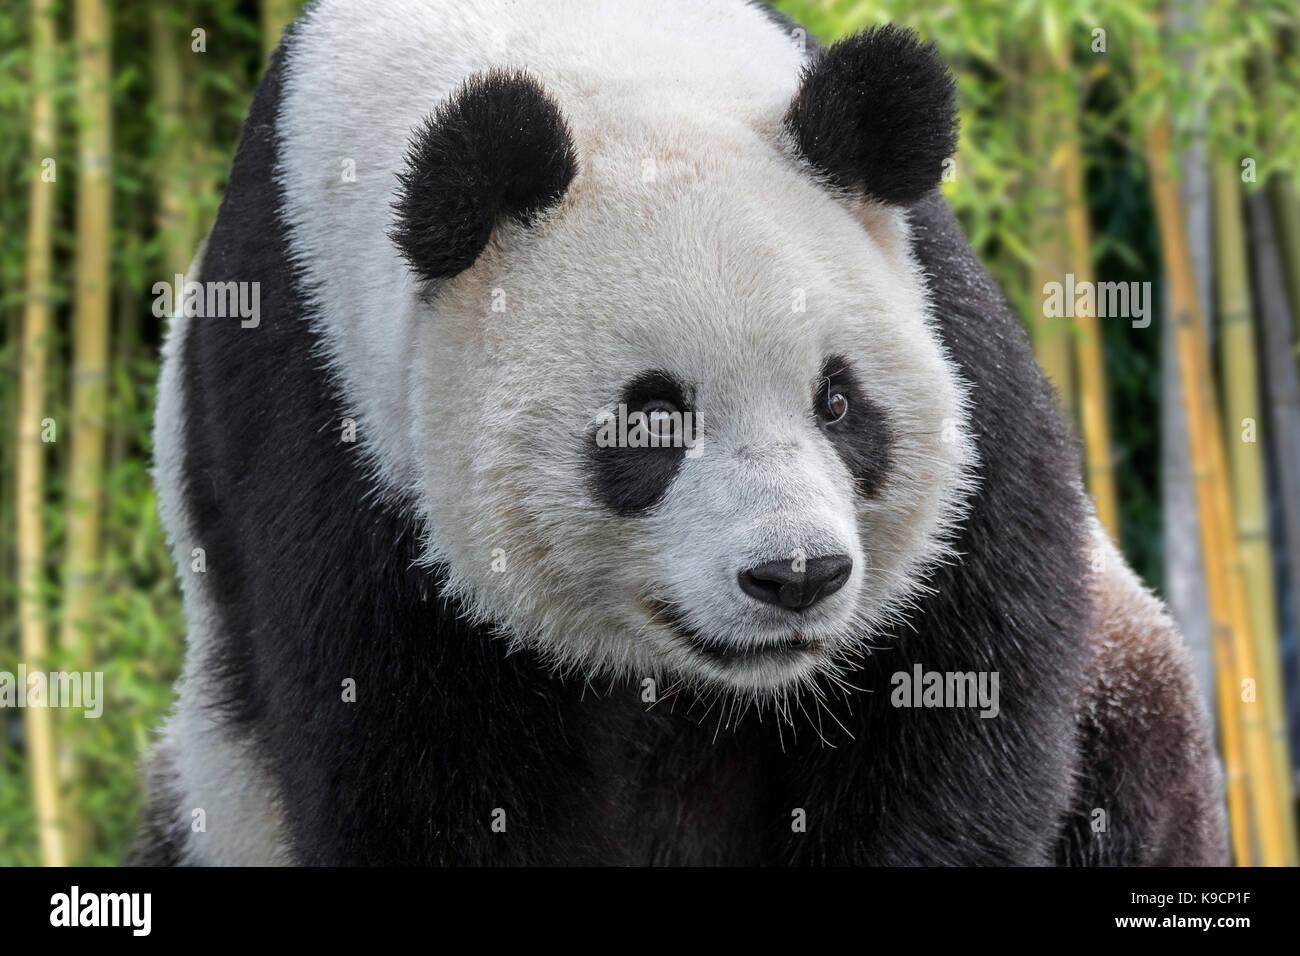 / Giant Panda panda (Ailuropoda melanoleuca) close up portrait dans la forêt de bambou Photo Stock